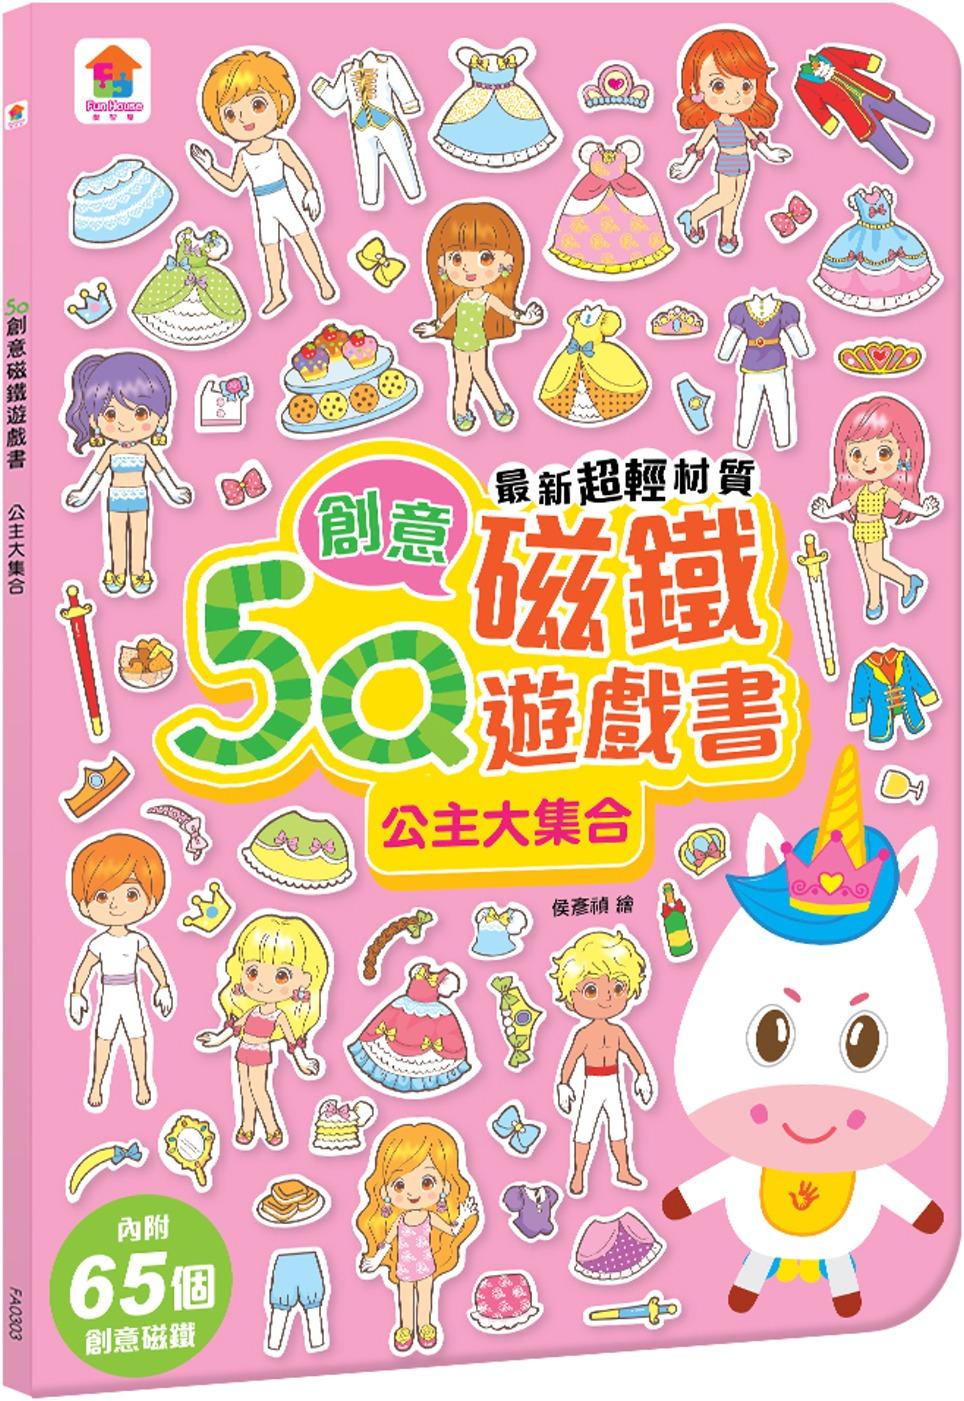 5Q創意磁鐵遊戲書:公主大集合(內附65個創意磁鐵+1個趣味大場景)